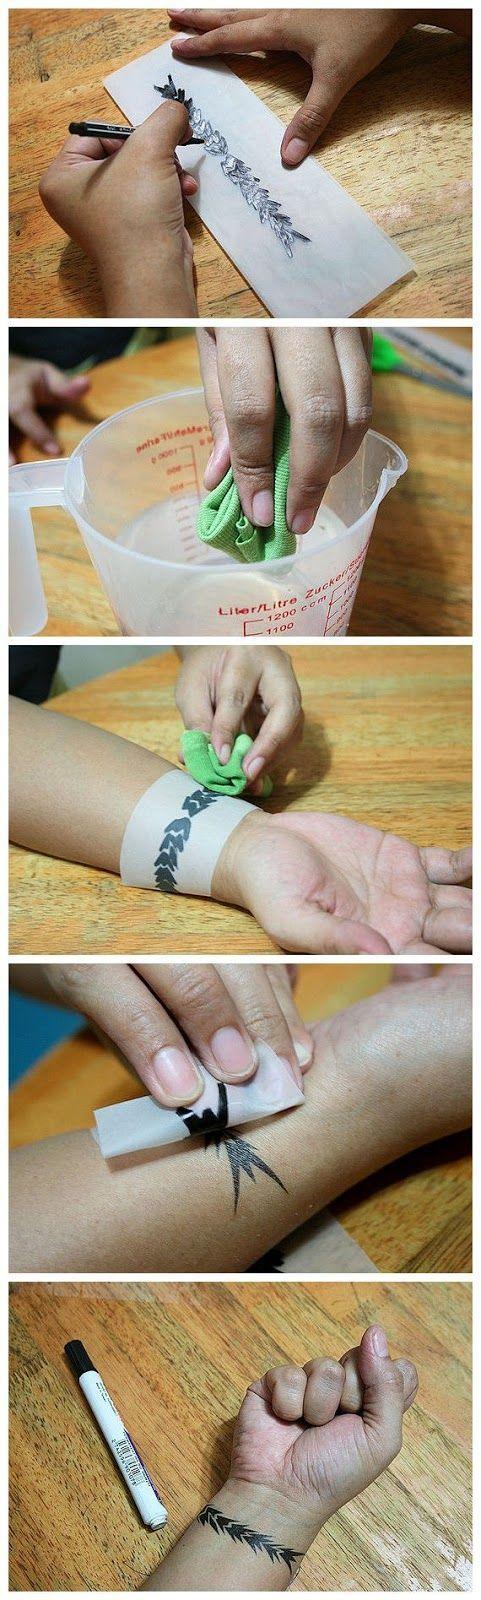 Make A Temporary Tattoo Diy Tattoo Cosplay Diy Temporary Tattoo